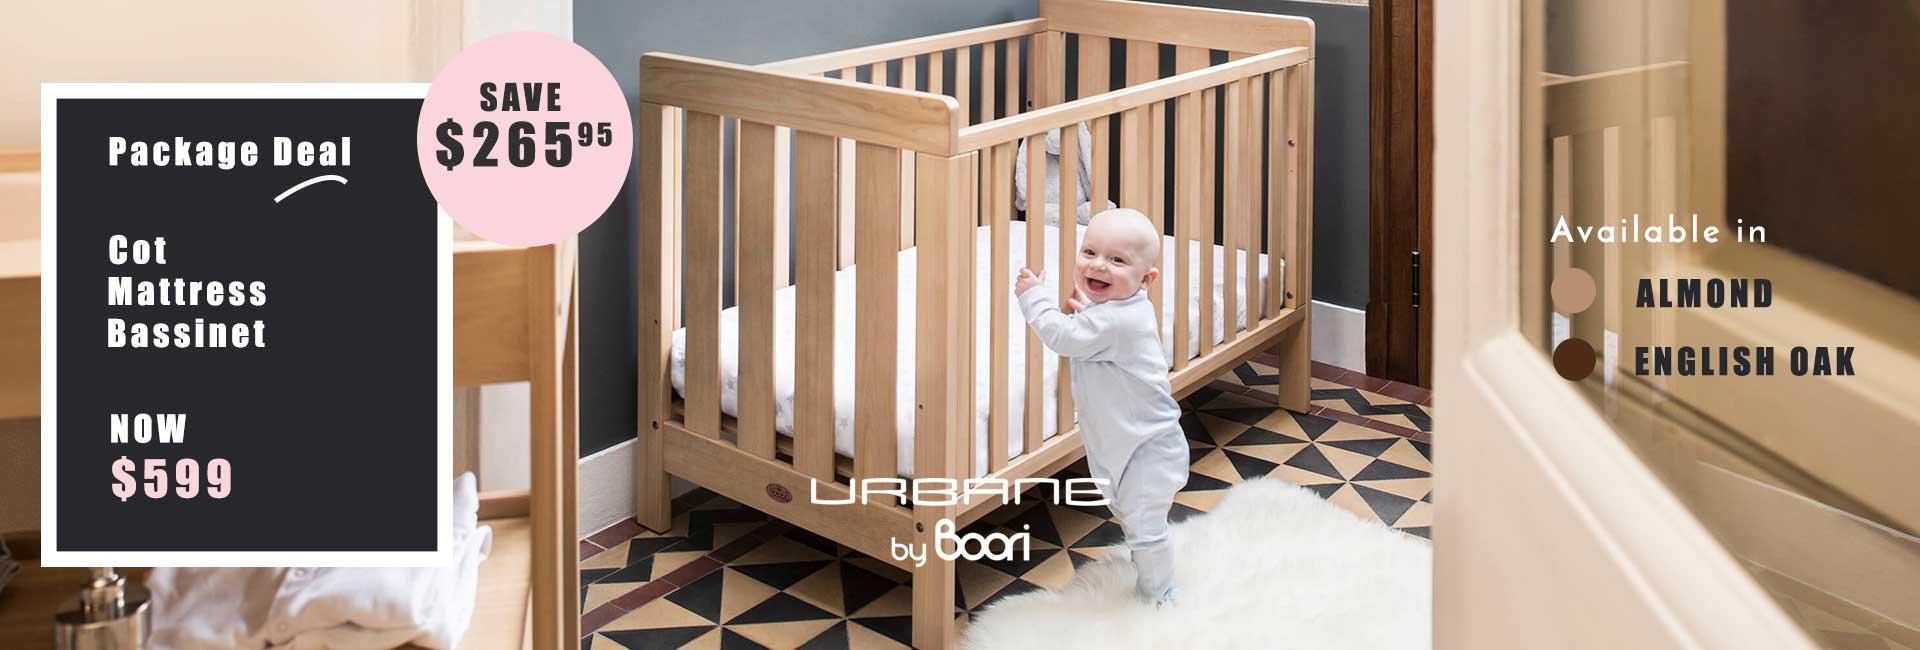 Boori Package Deal cot, mattress and bassinet